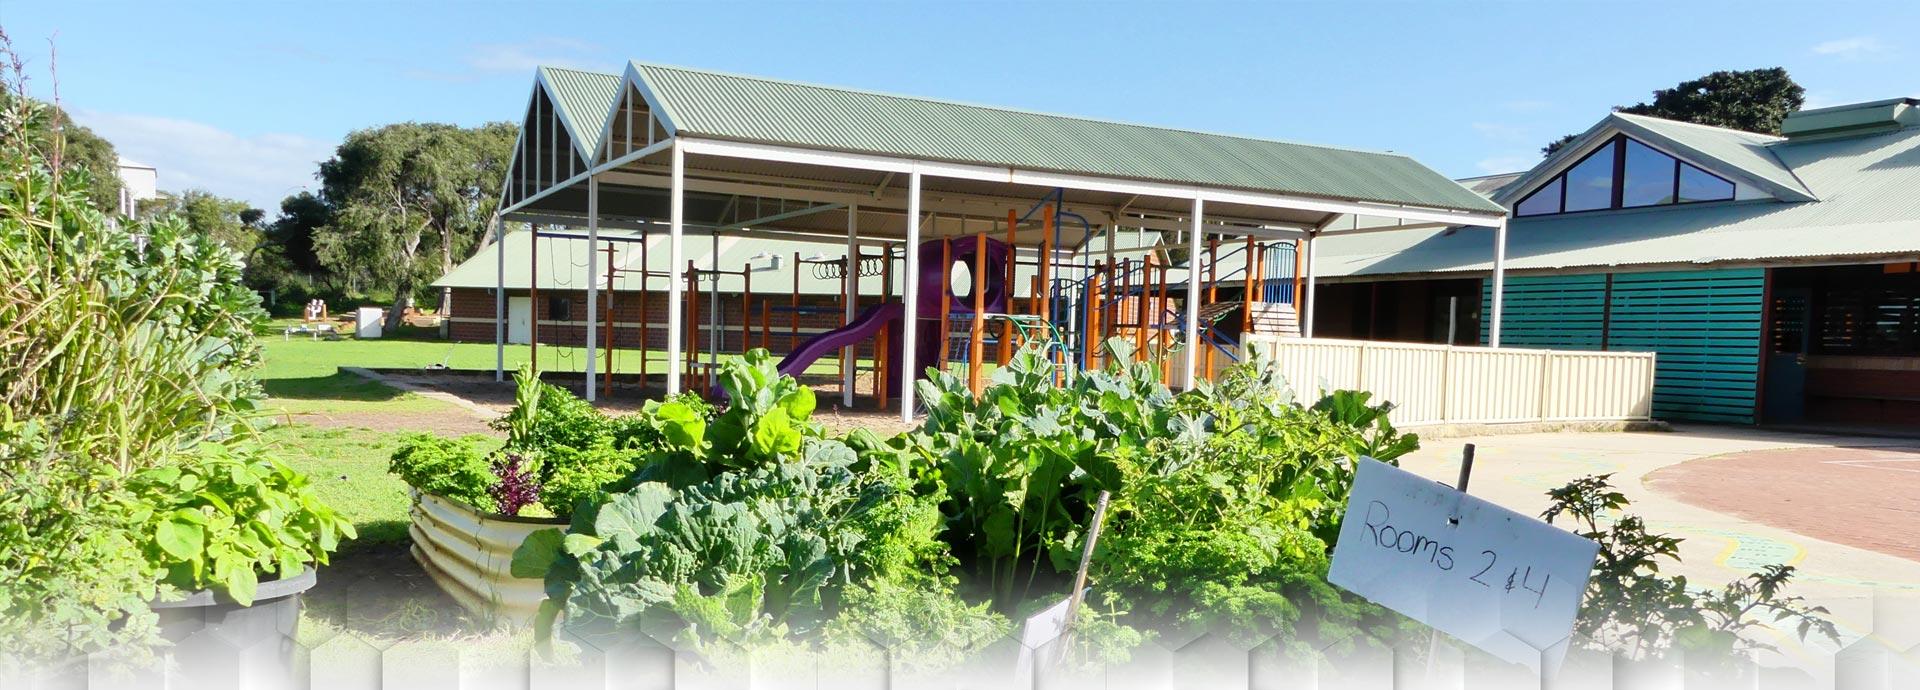 SCHOOL REVIEW COOGEE PRIMARY SCHOOL